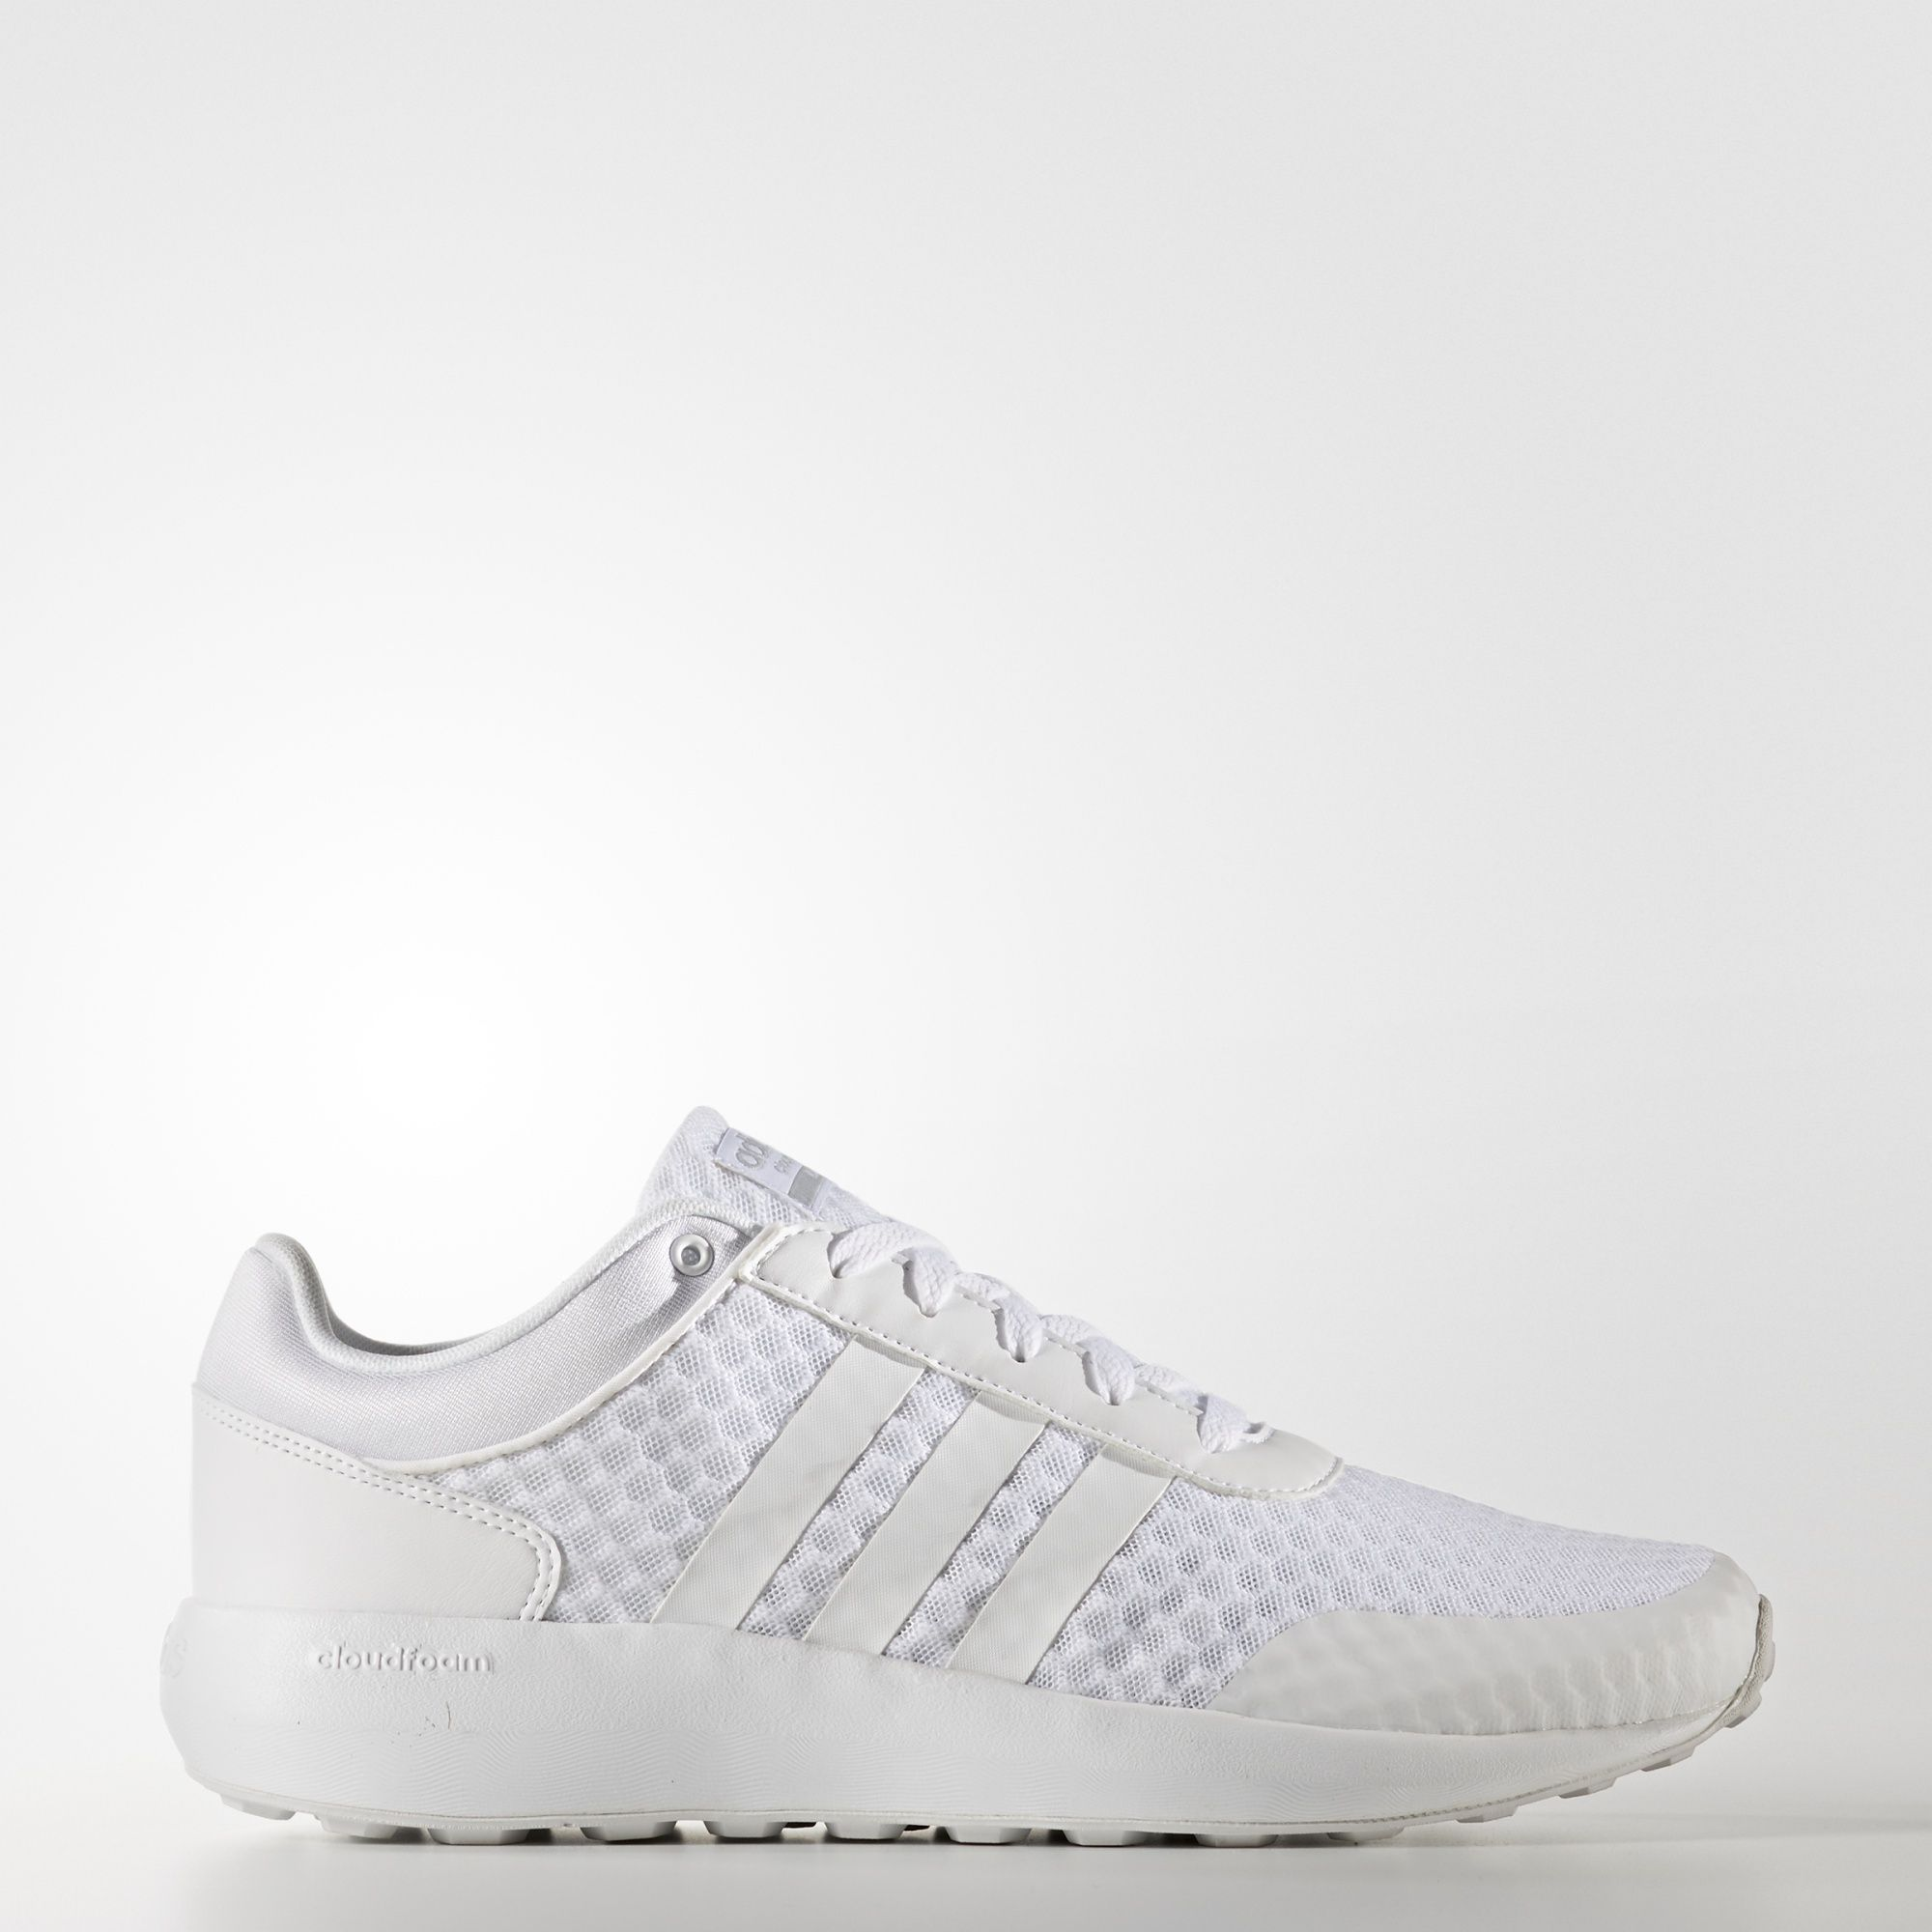 adidas Cloudfoam Race Shoes - White